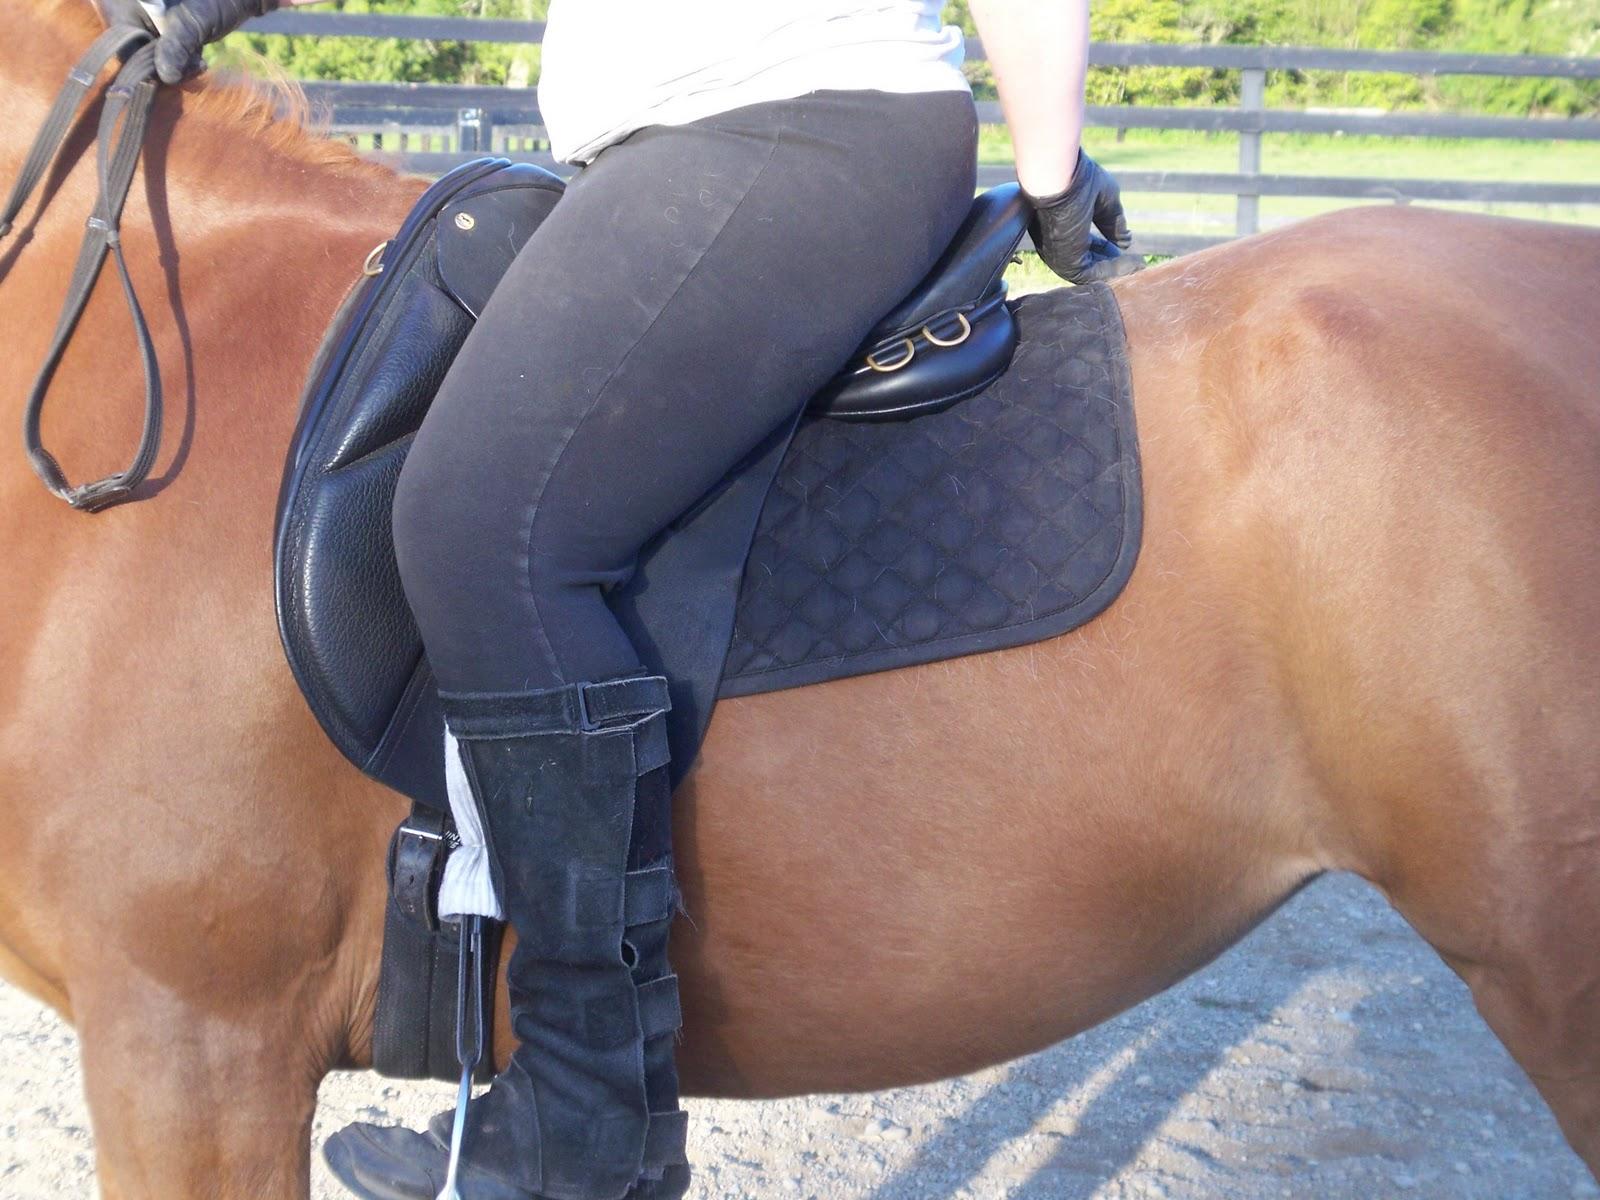 Northwest Desert Horses: Searching for a saddle